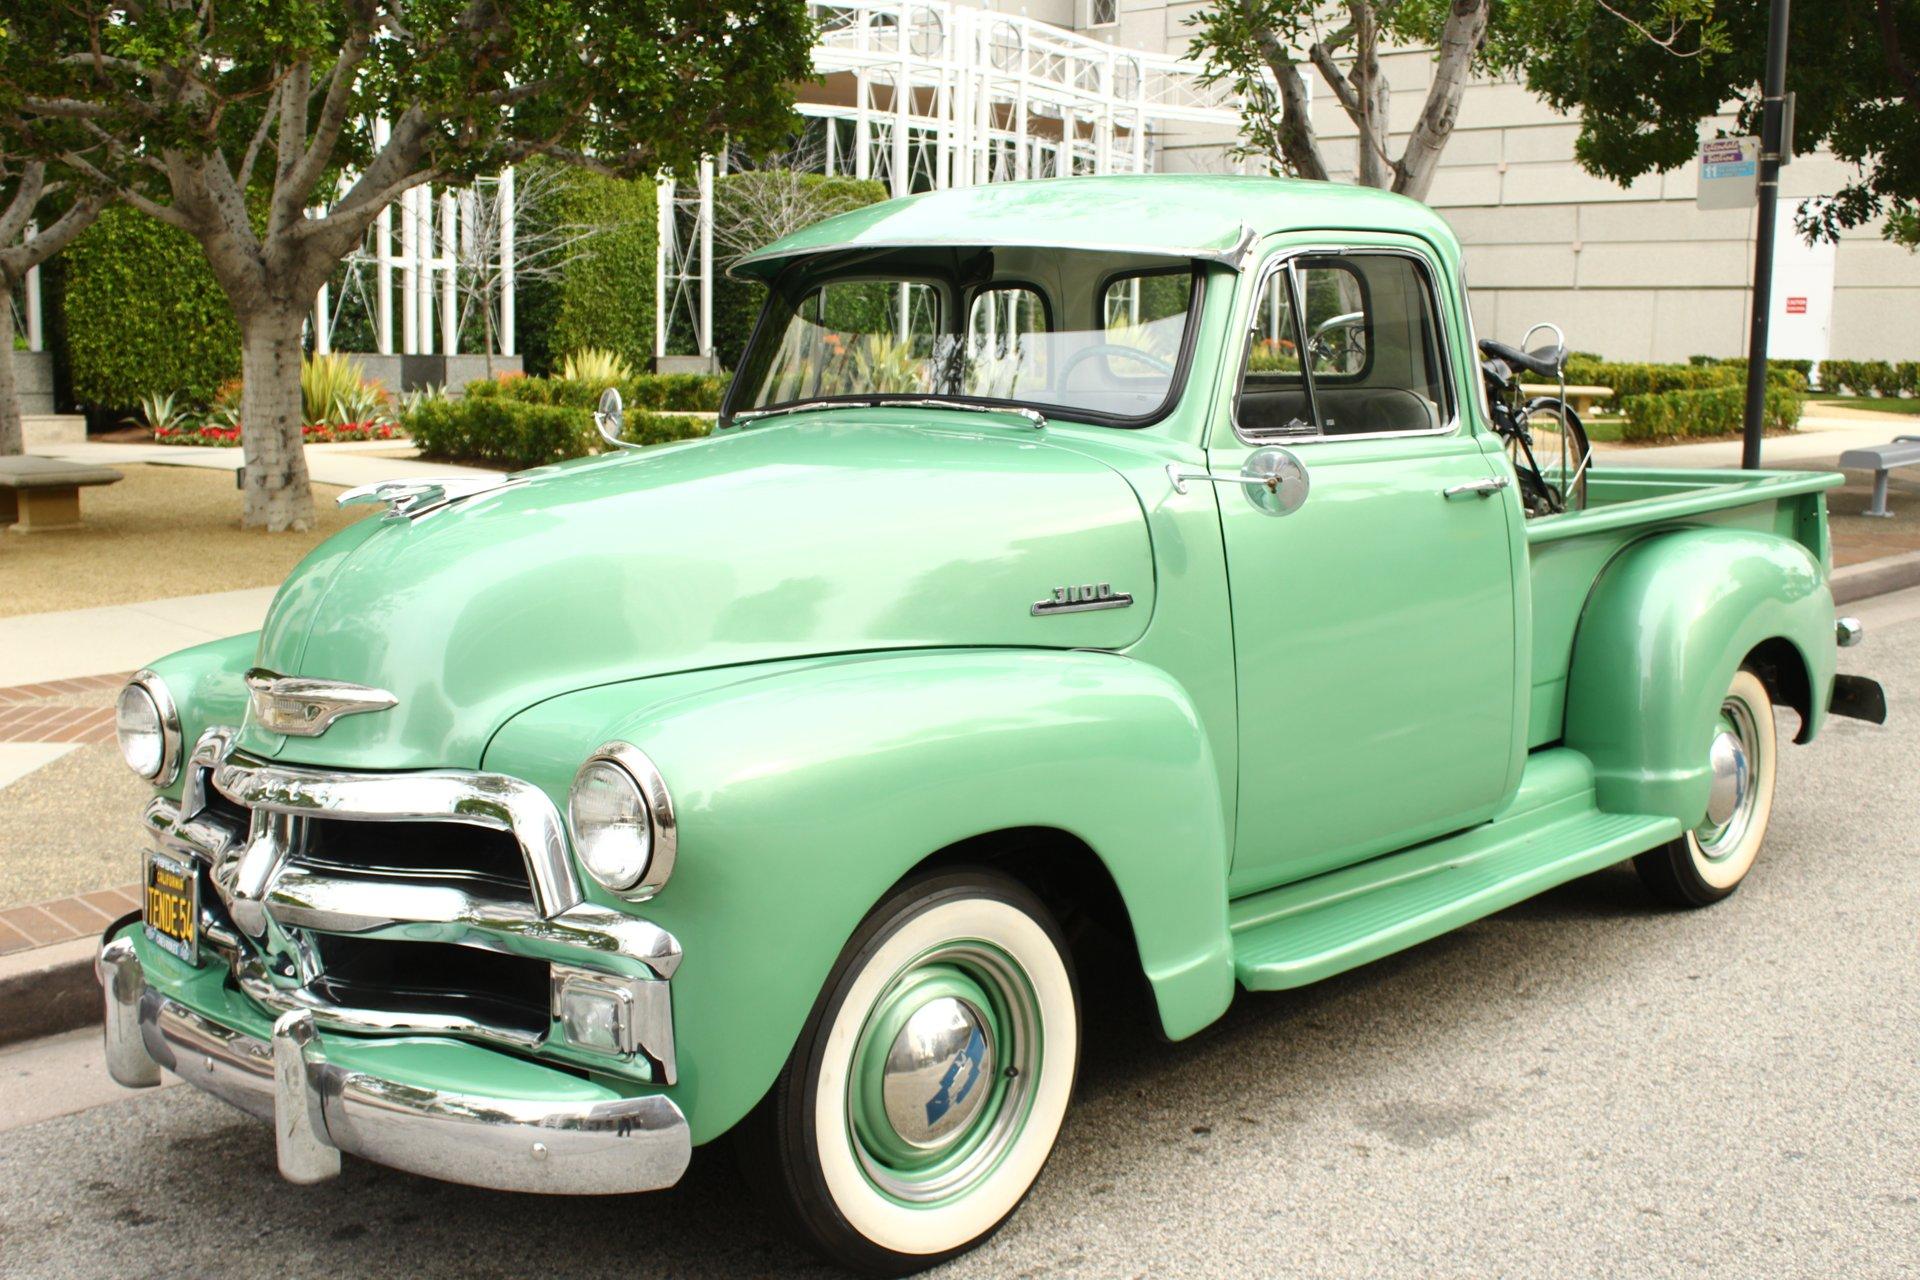 1954 Chevrolet Advance-Design